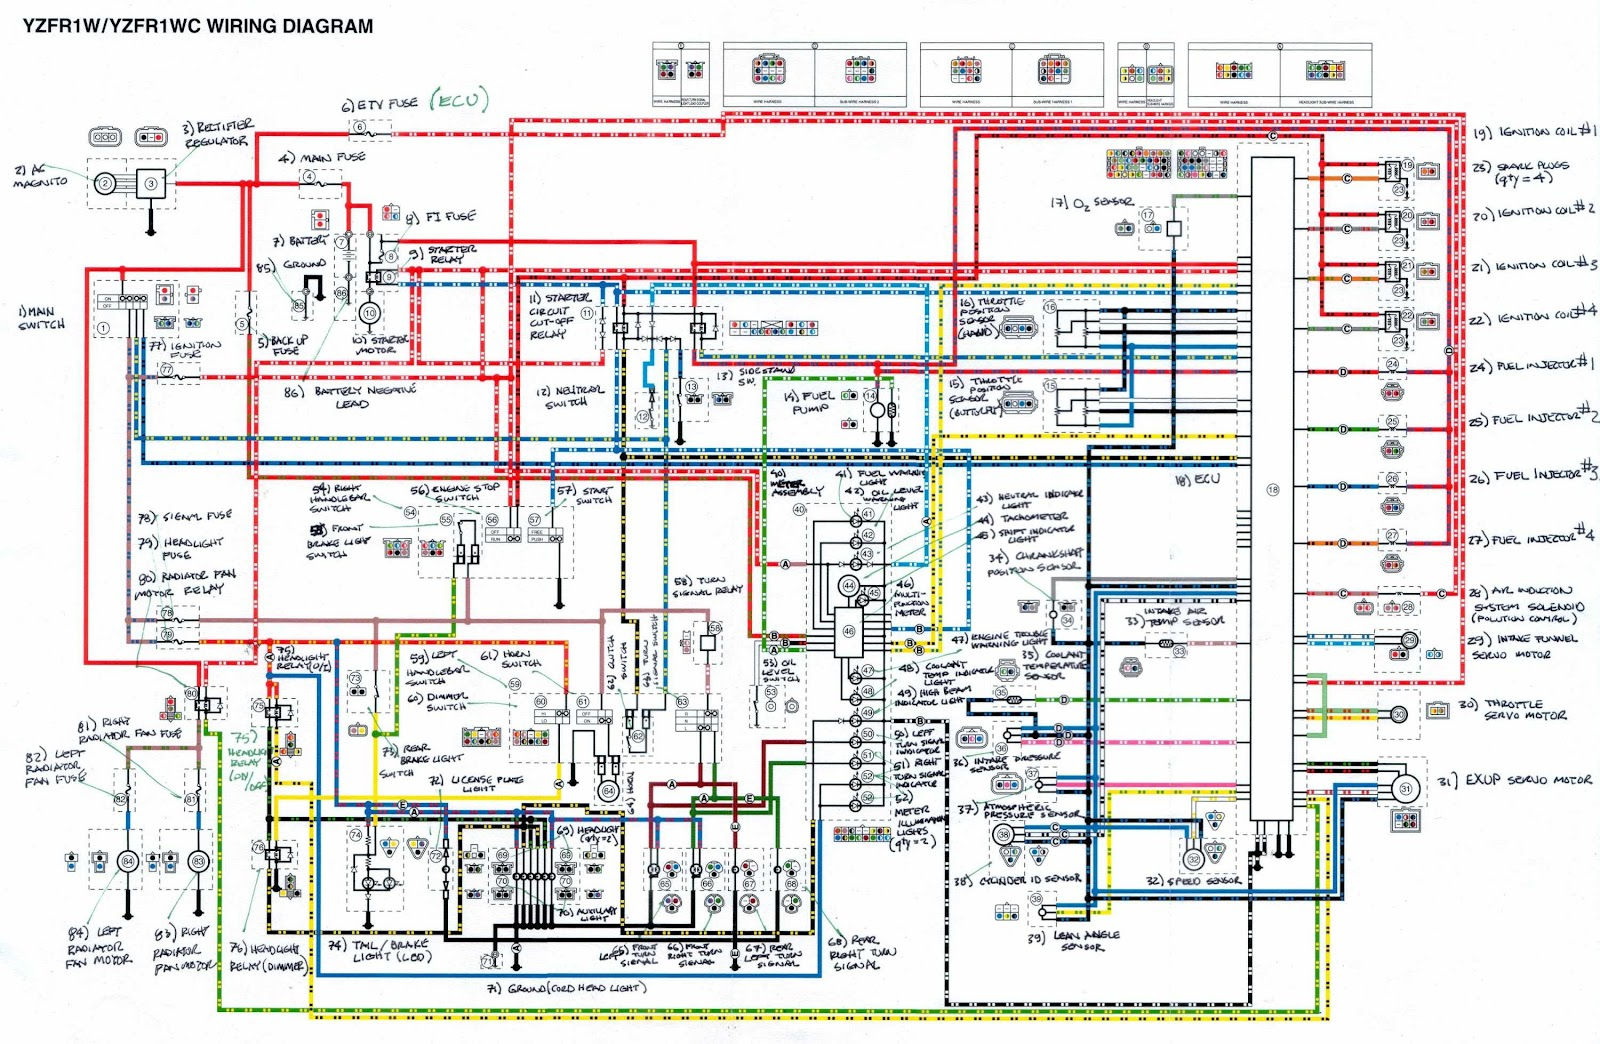 Yamaha+YZF R1+Motorcycle+Wiring+Diagram?resize\=665%2C434 2001 yamaha warrior wiring diagram 1989 yamaha xt 350 wire diagram 2004 yamaha yzf r6 wiring diagram at bayanpartner.co